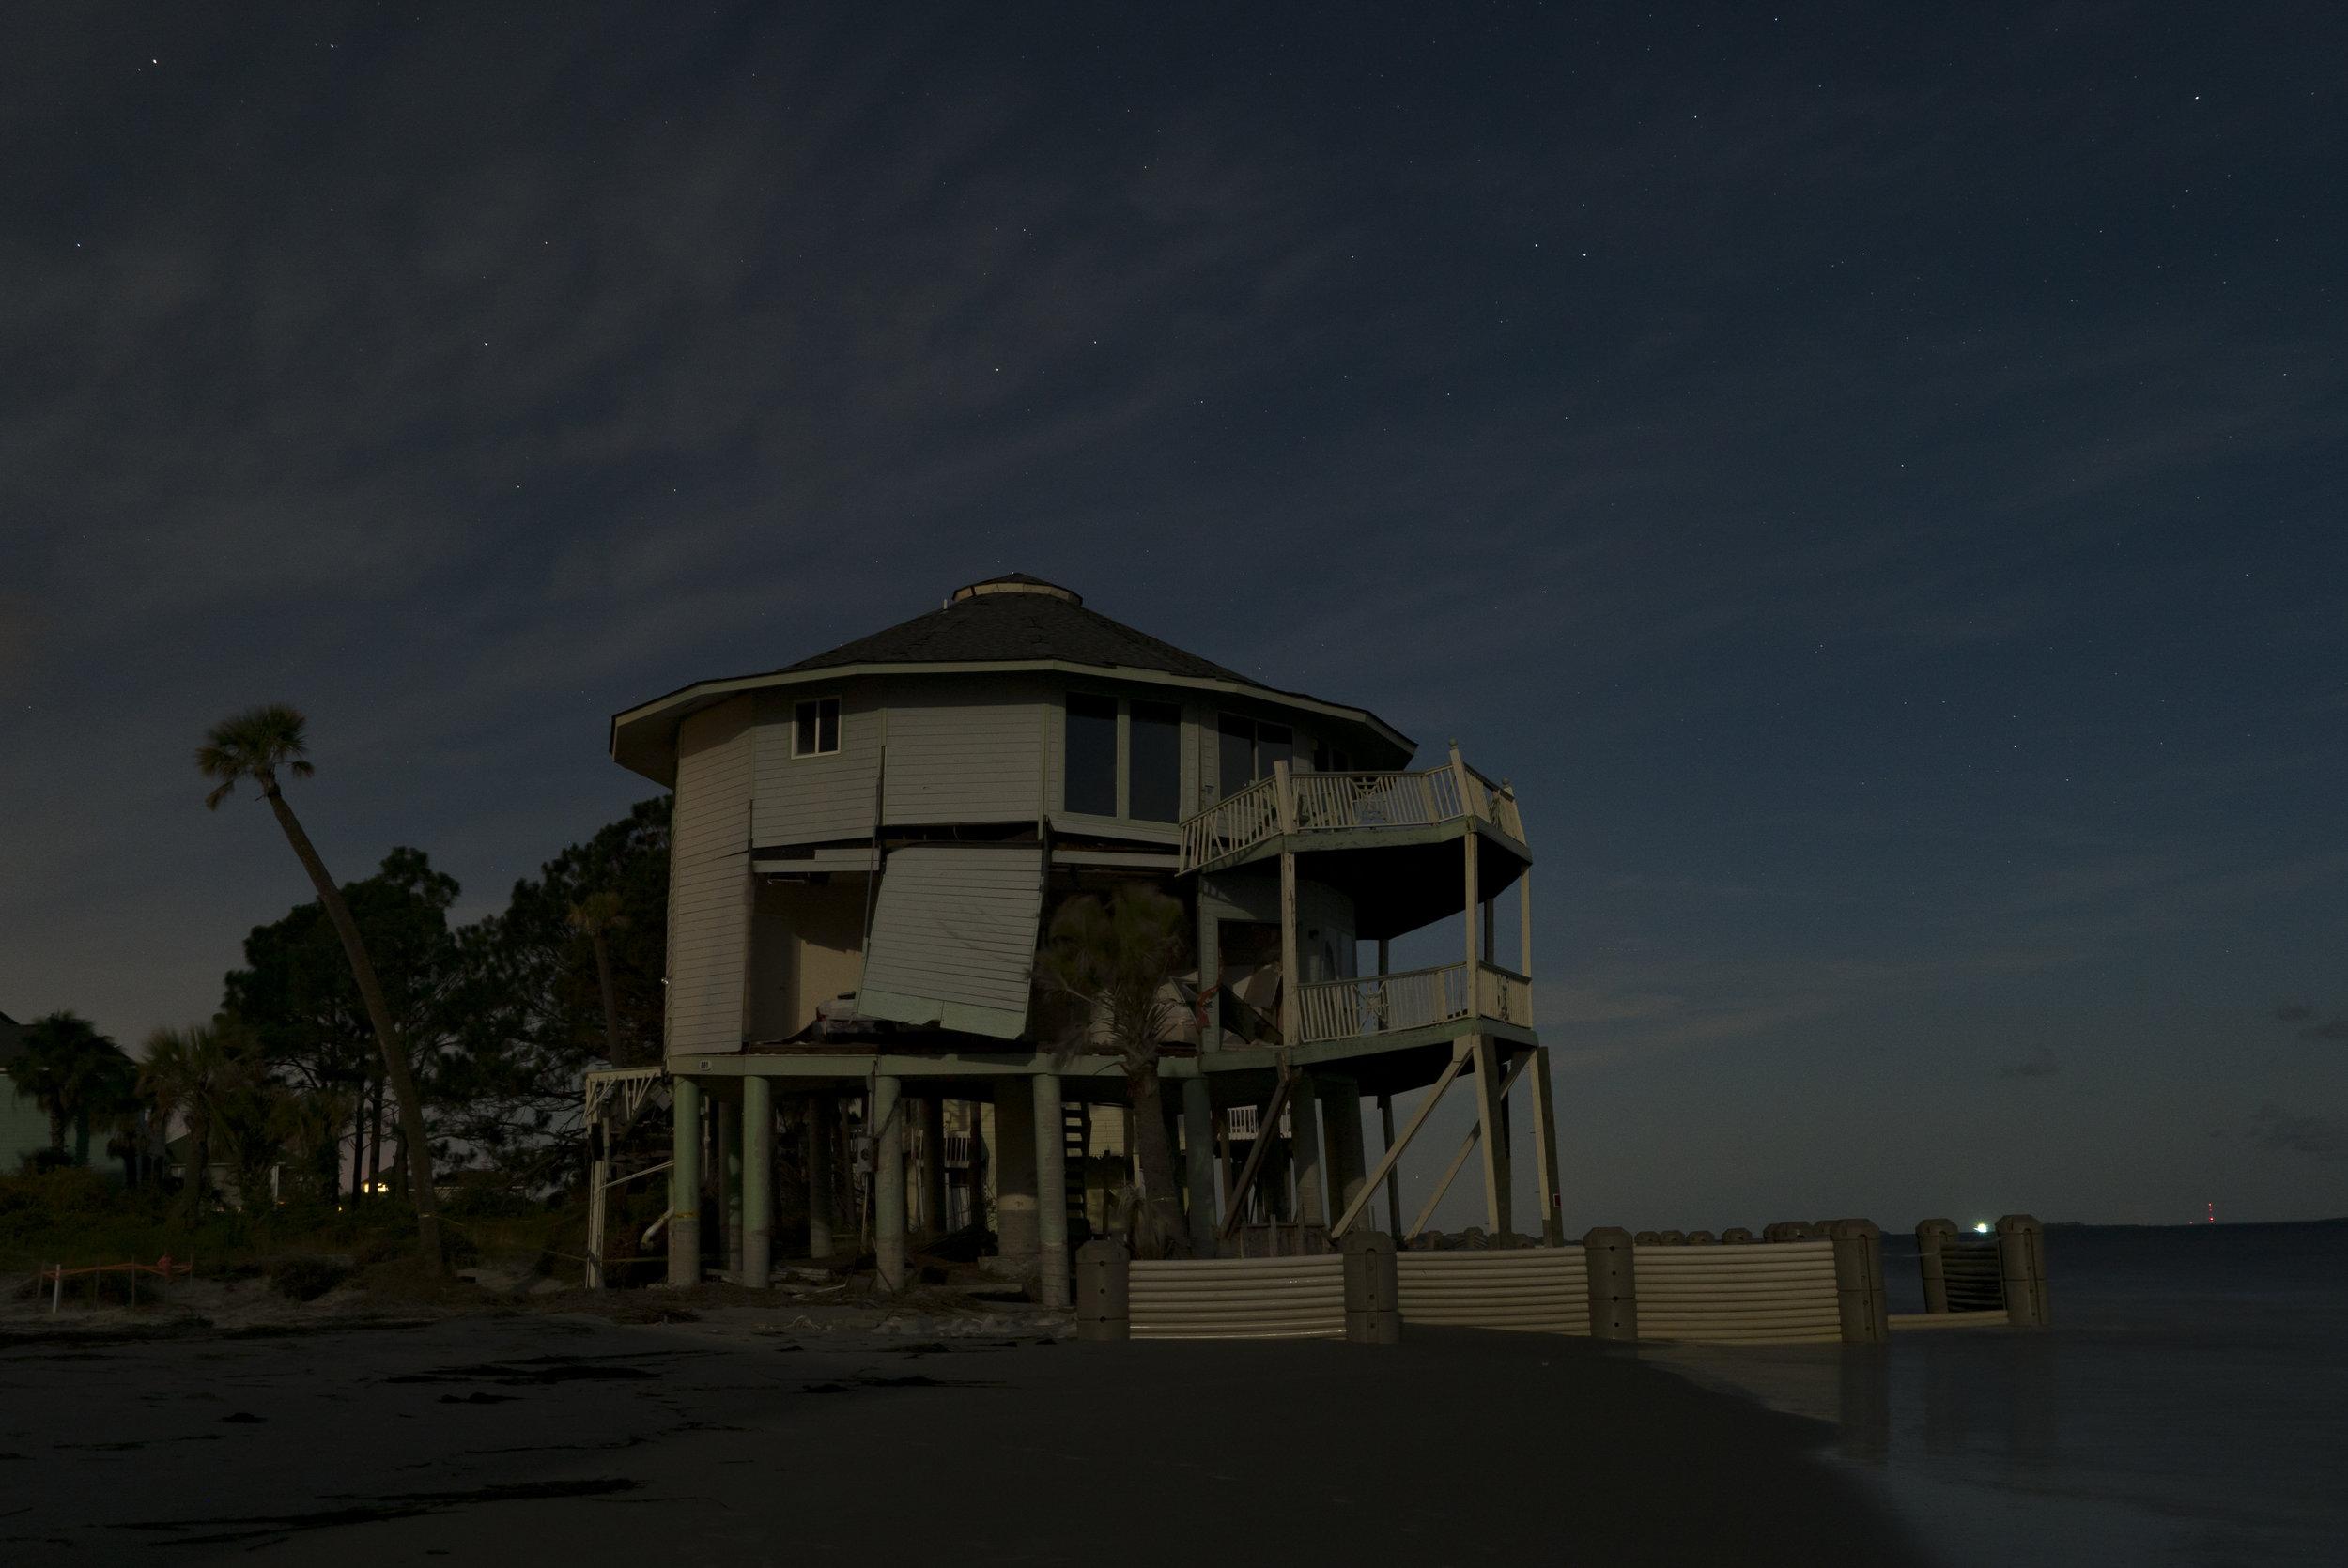 Home destroyed by Hurricane Matthew. Harbor Island, SC